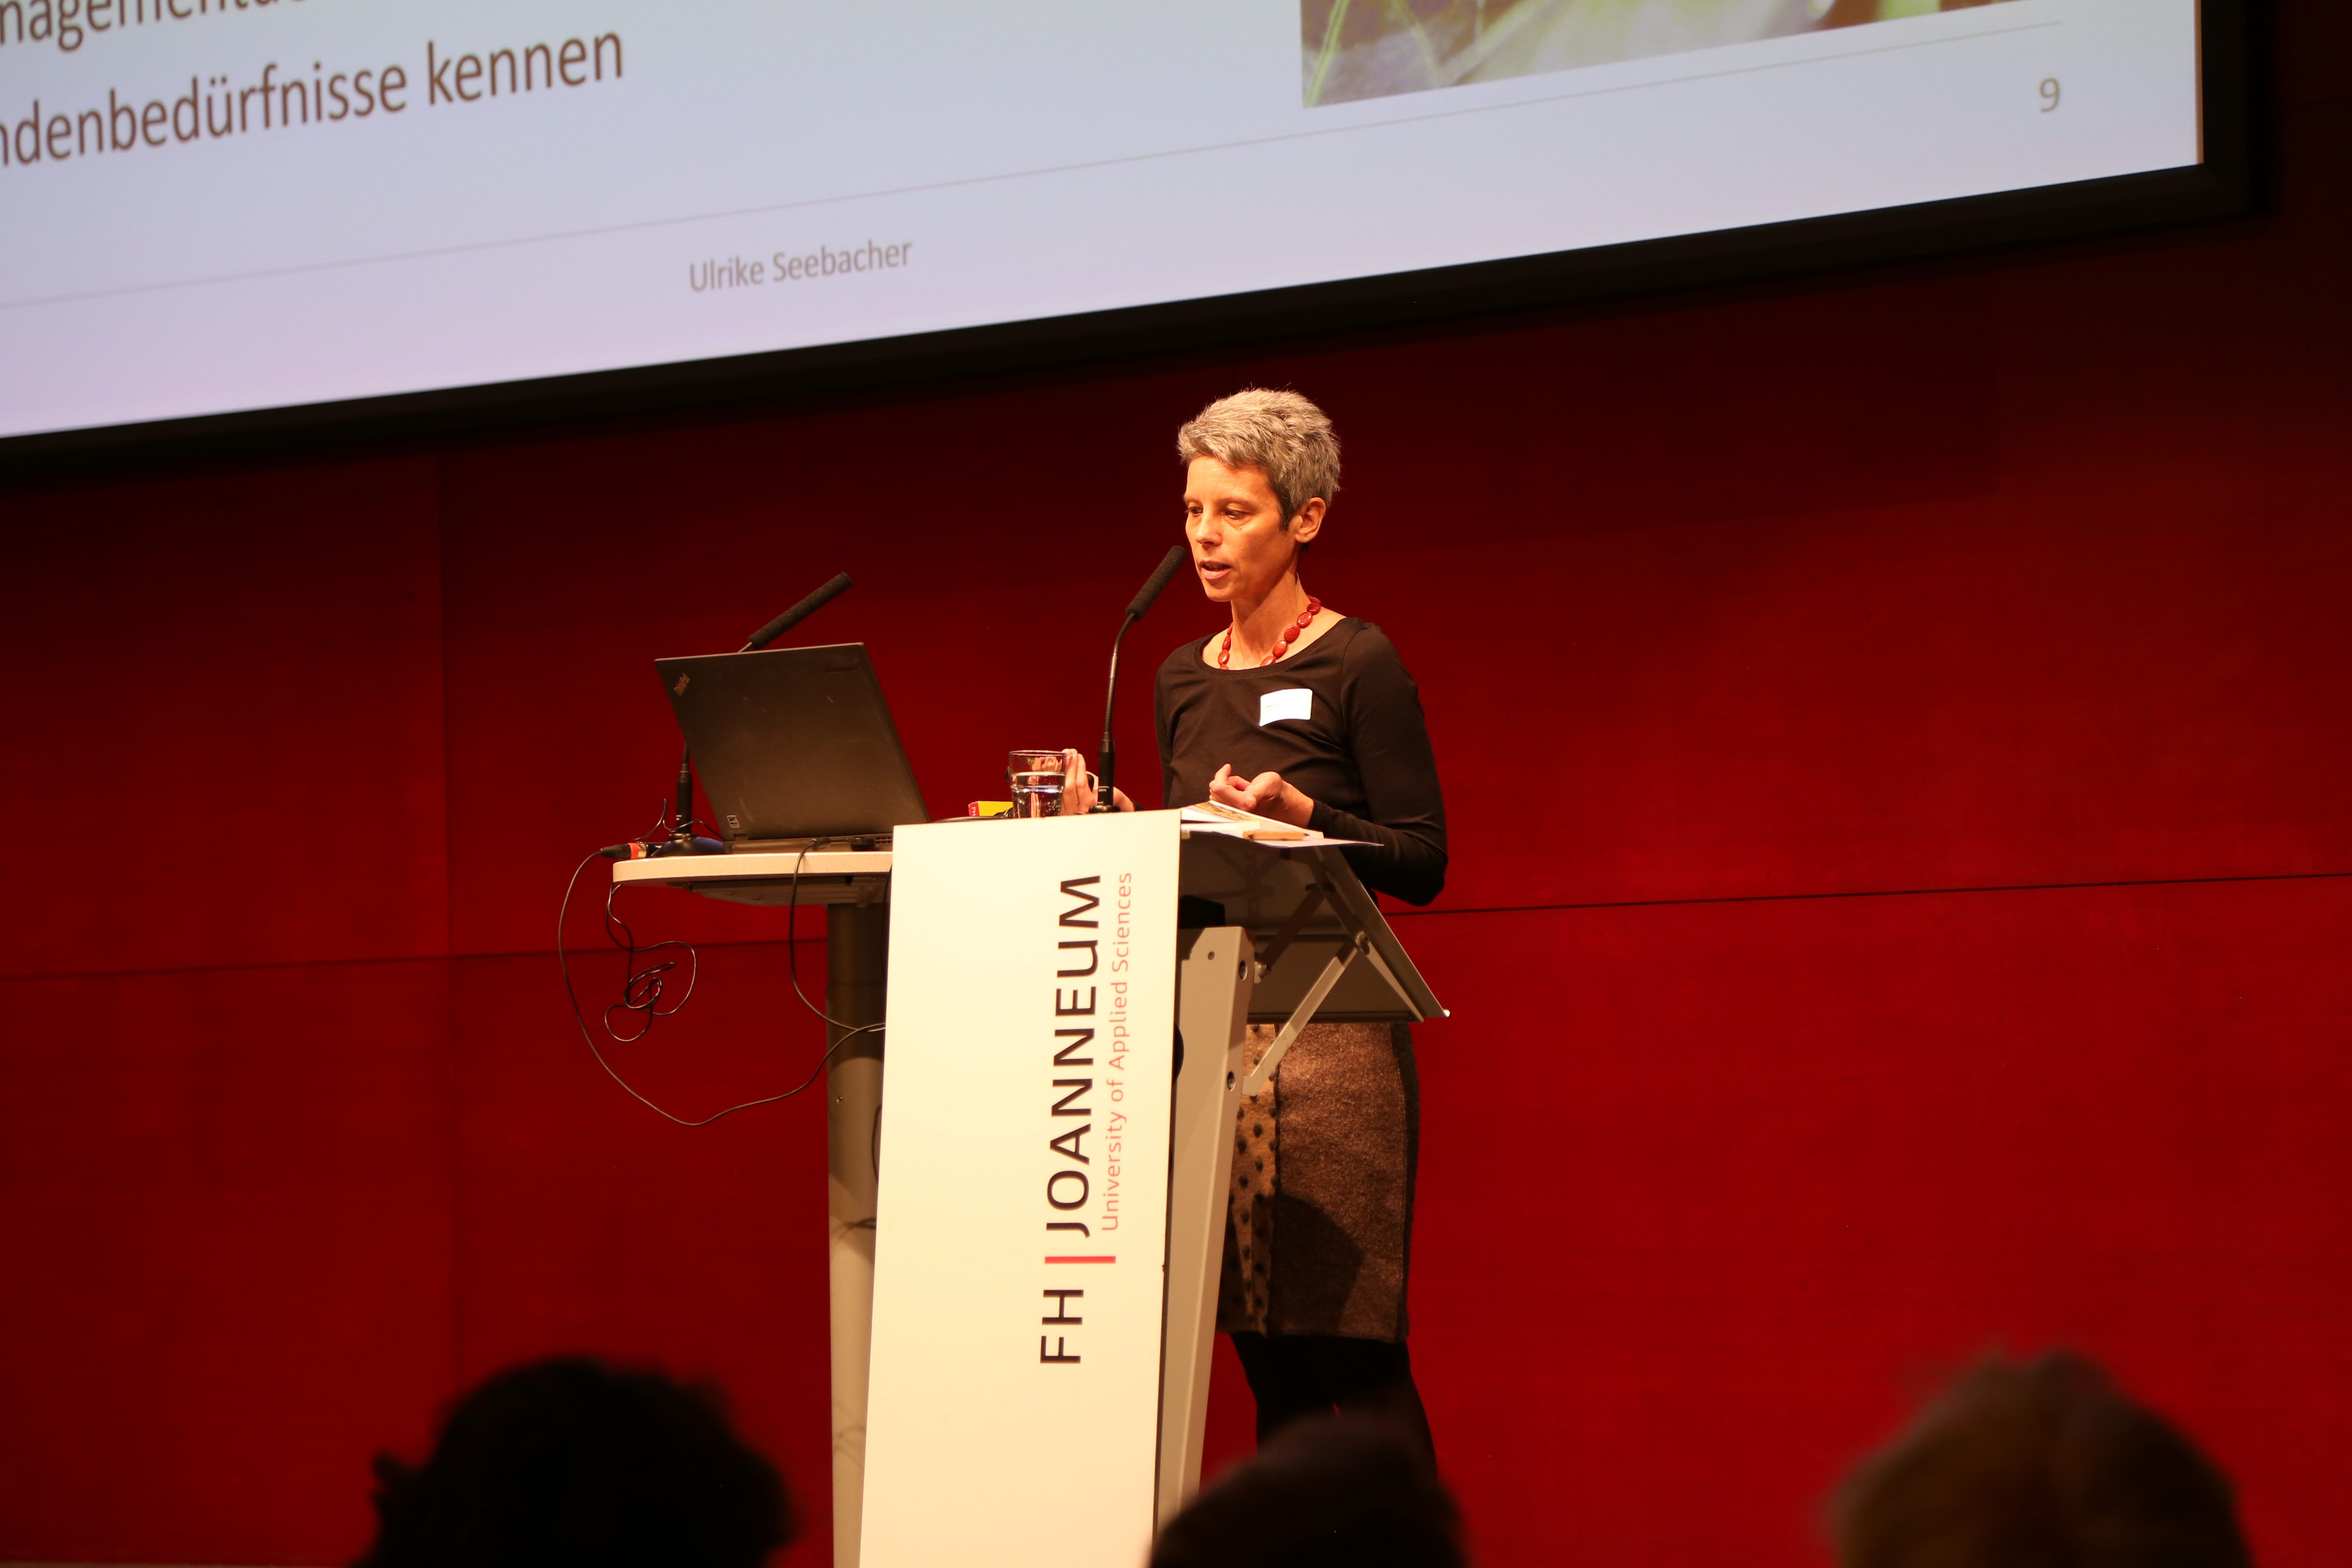 Ulrike Seebacher bei der Veranstaltung an der FH JOANNEUM.